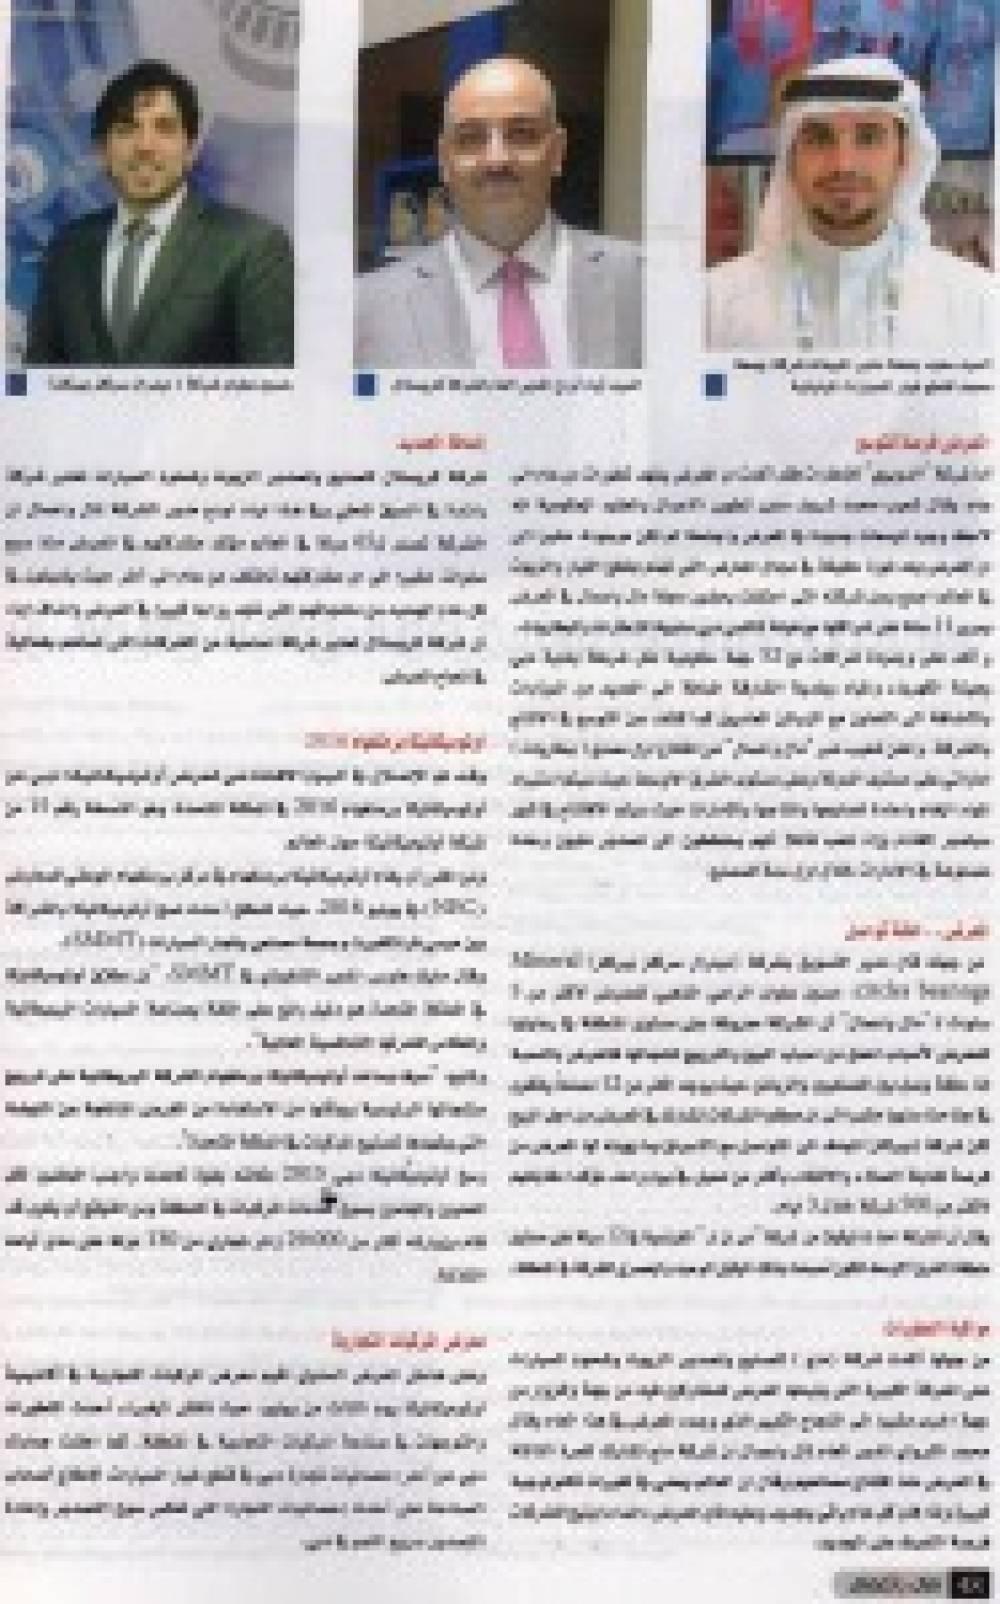 MCB bearings Featured on Finance & Business Arabic Magazine